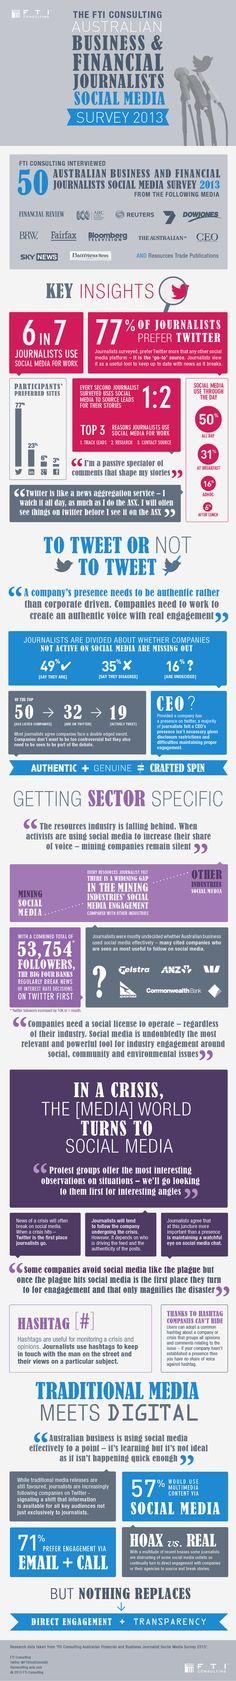 Australian business and financial journalist social media survey 2013